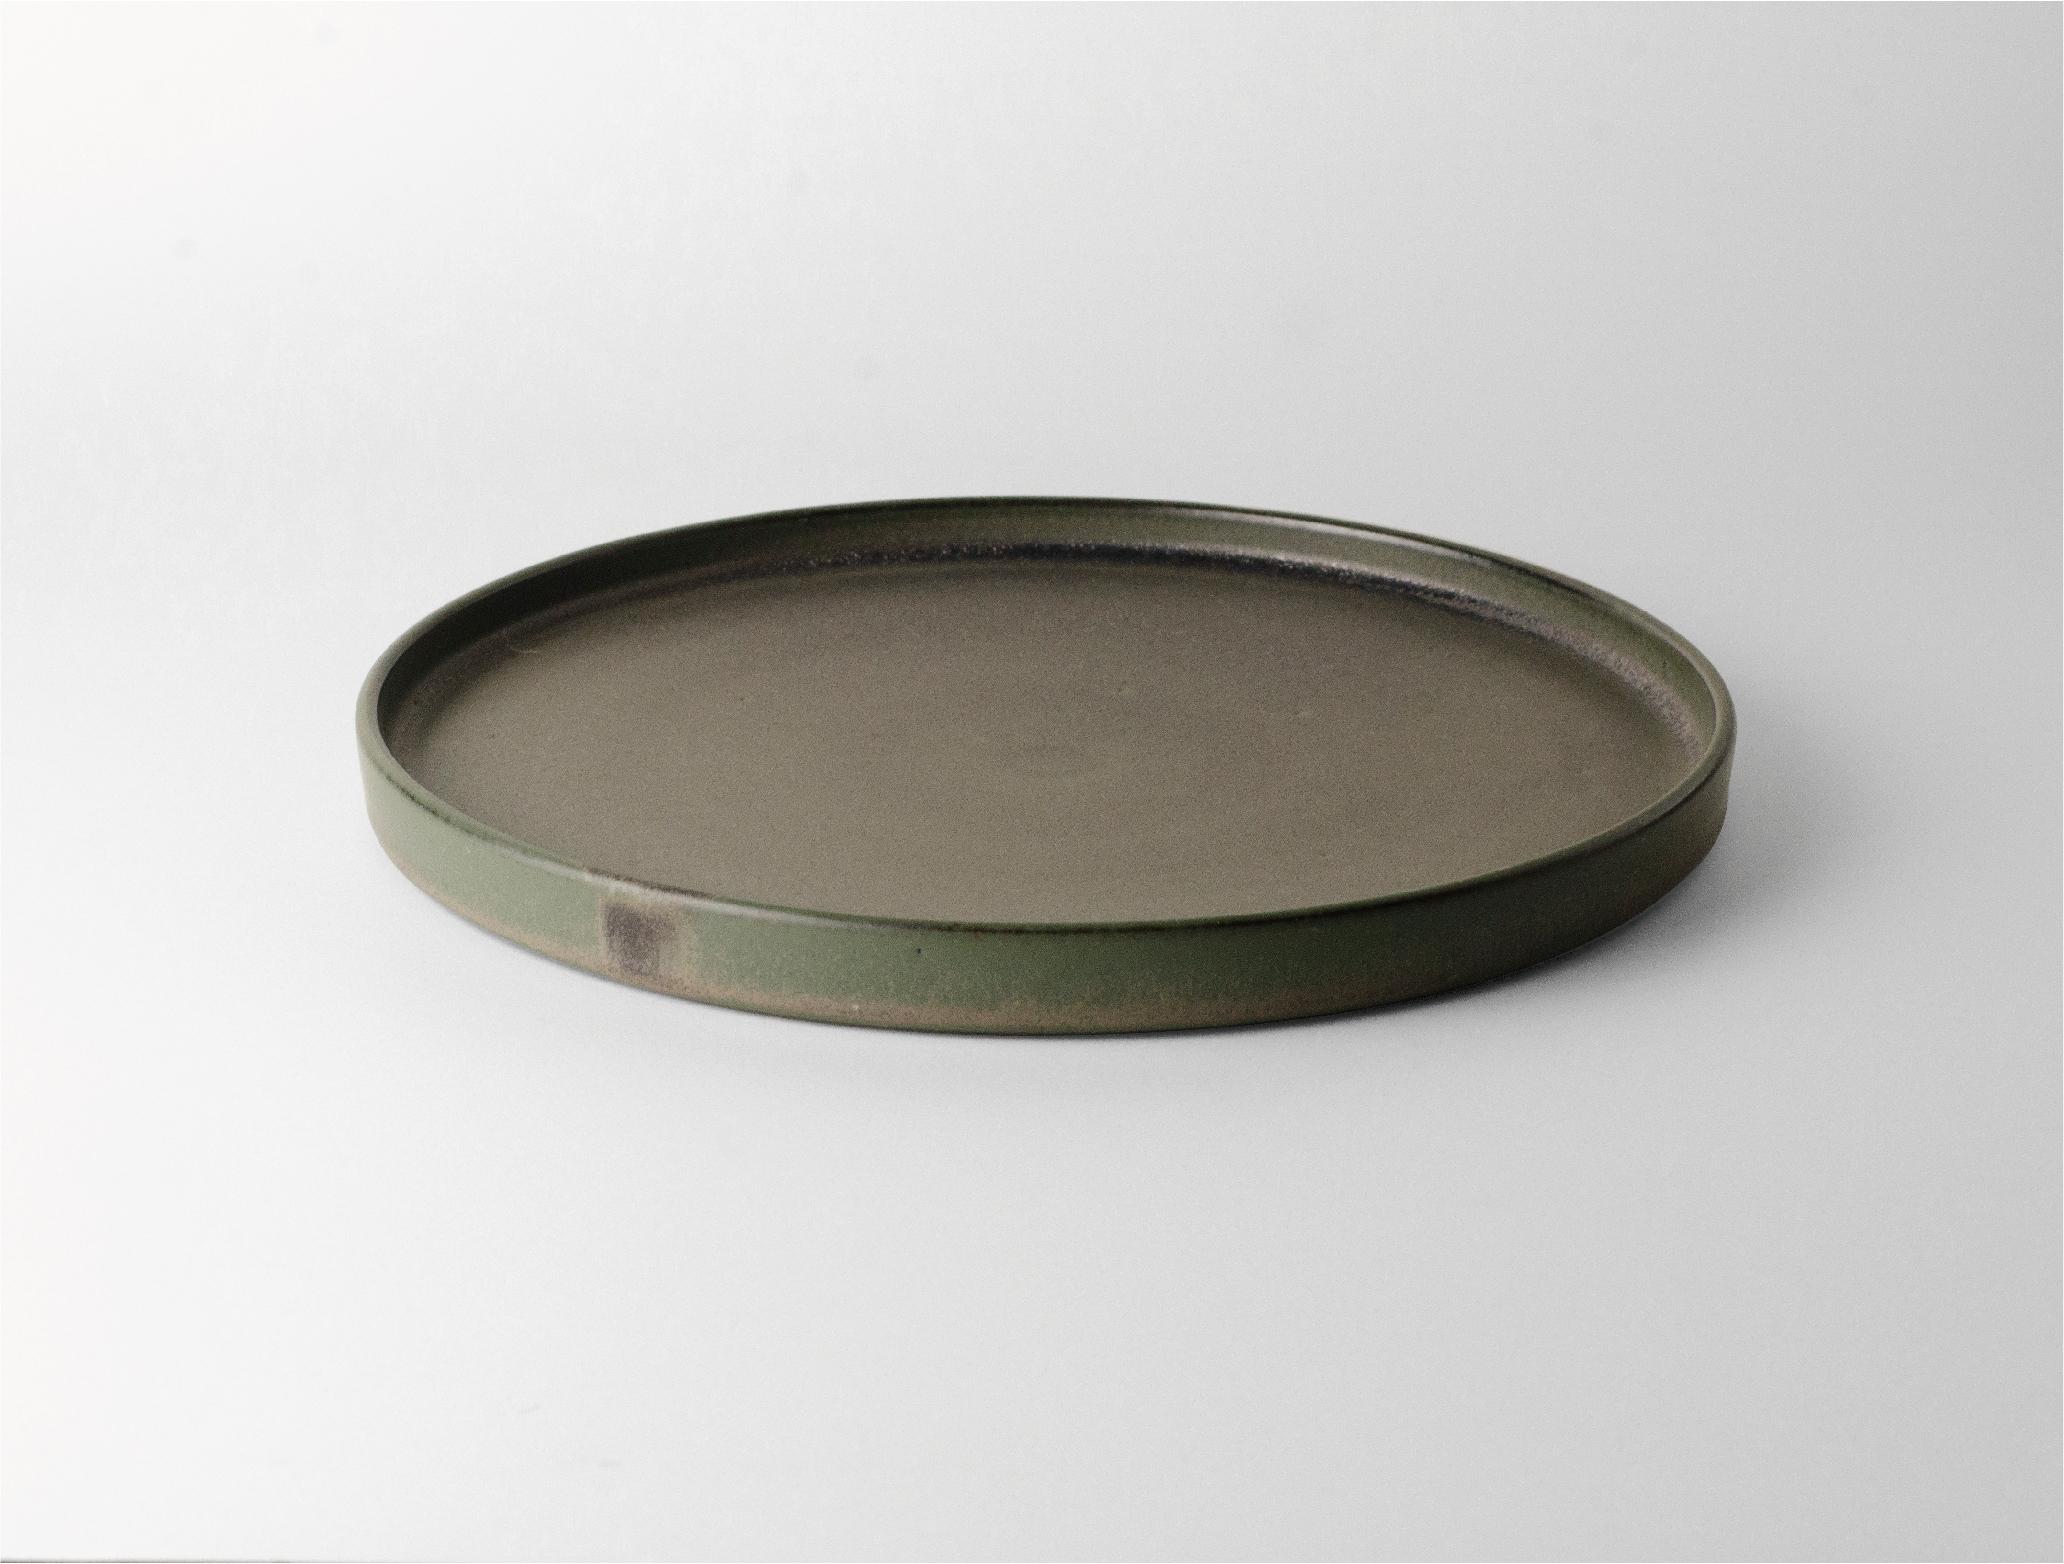 hasu_yamagasumi 皿 Mのイメージ